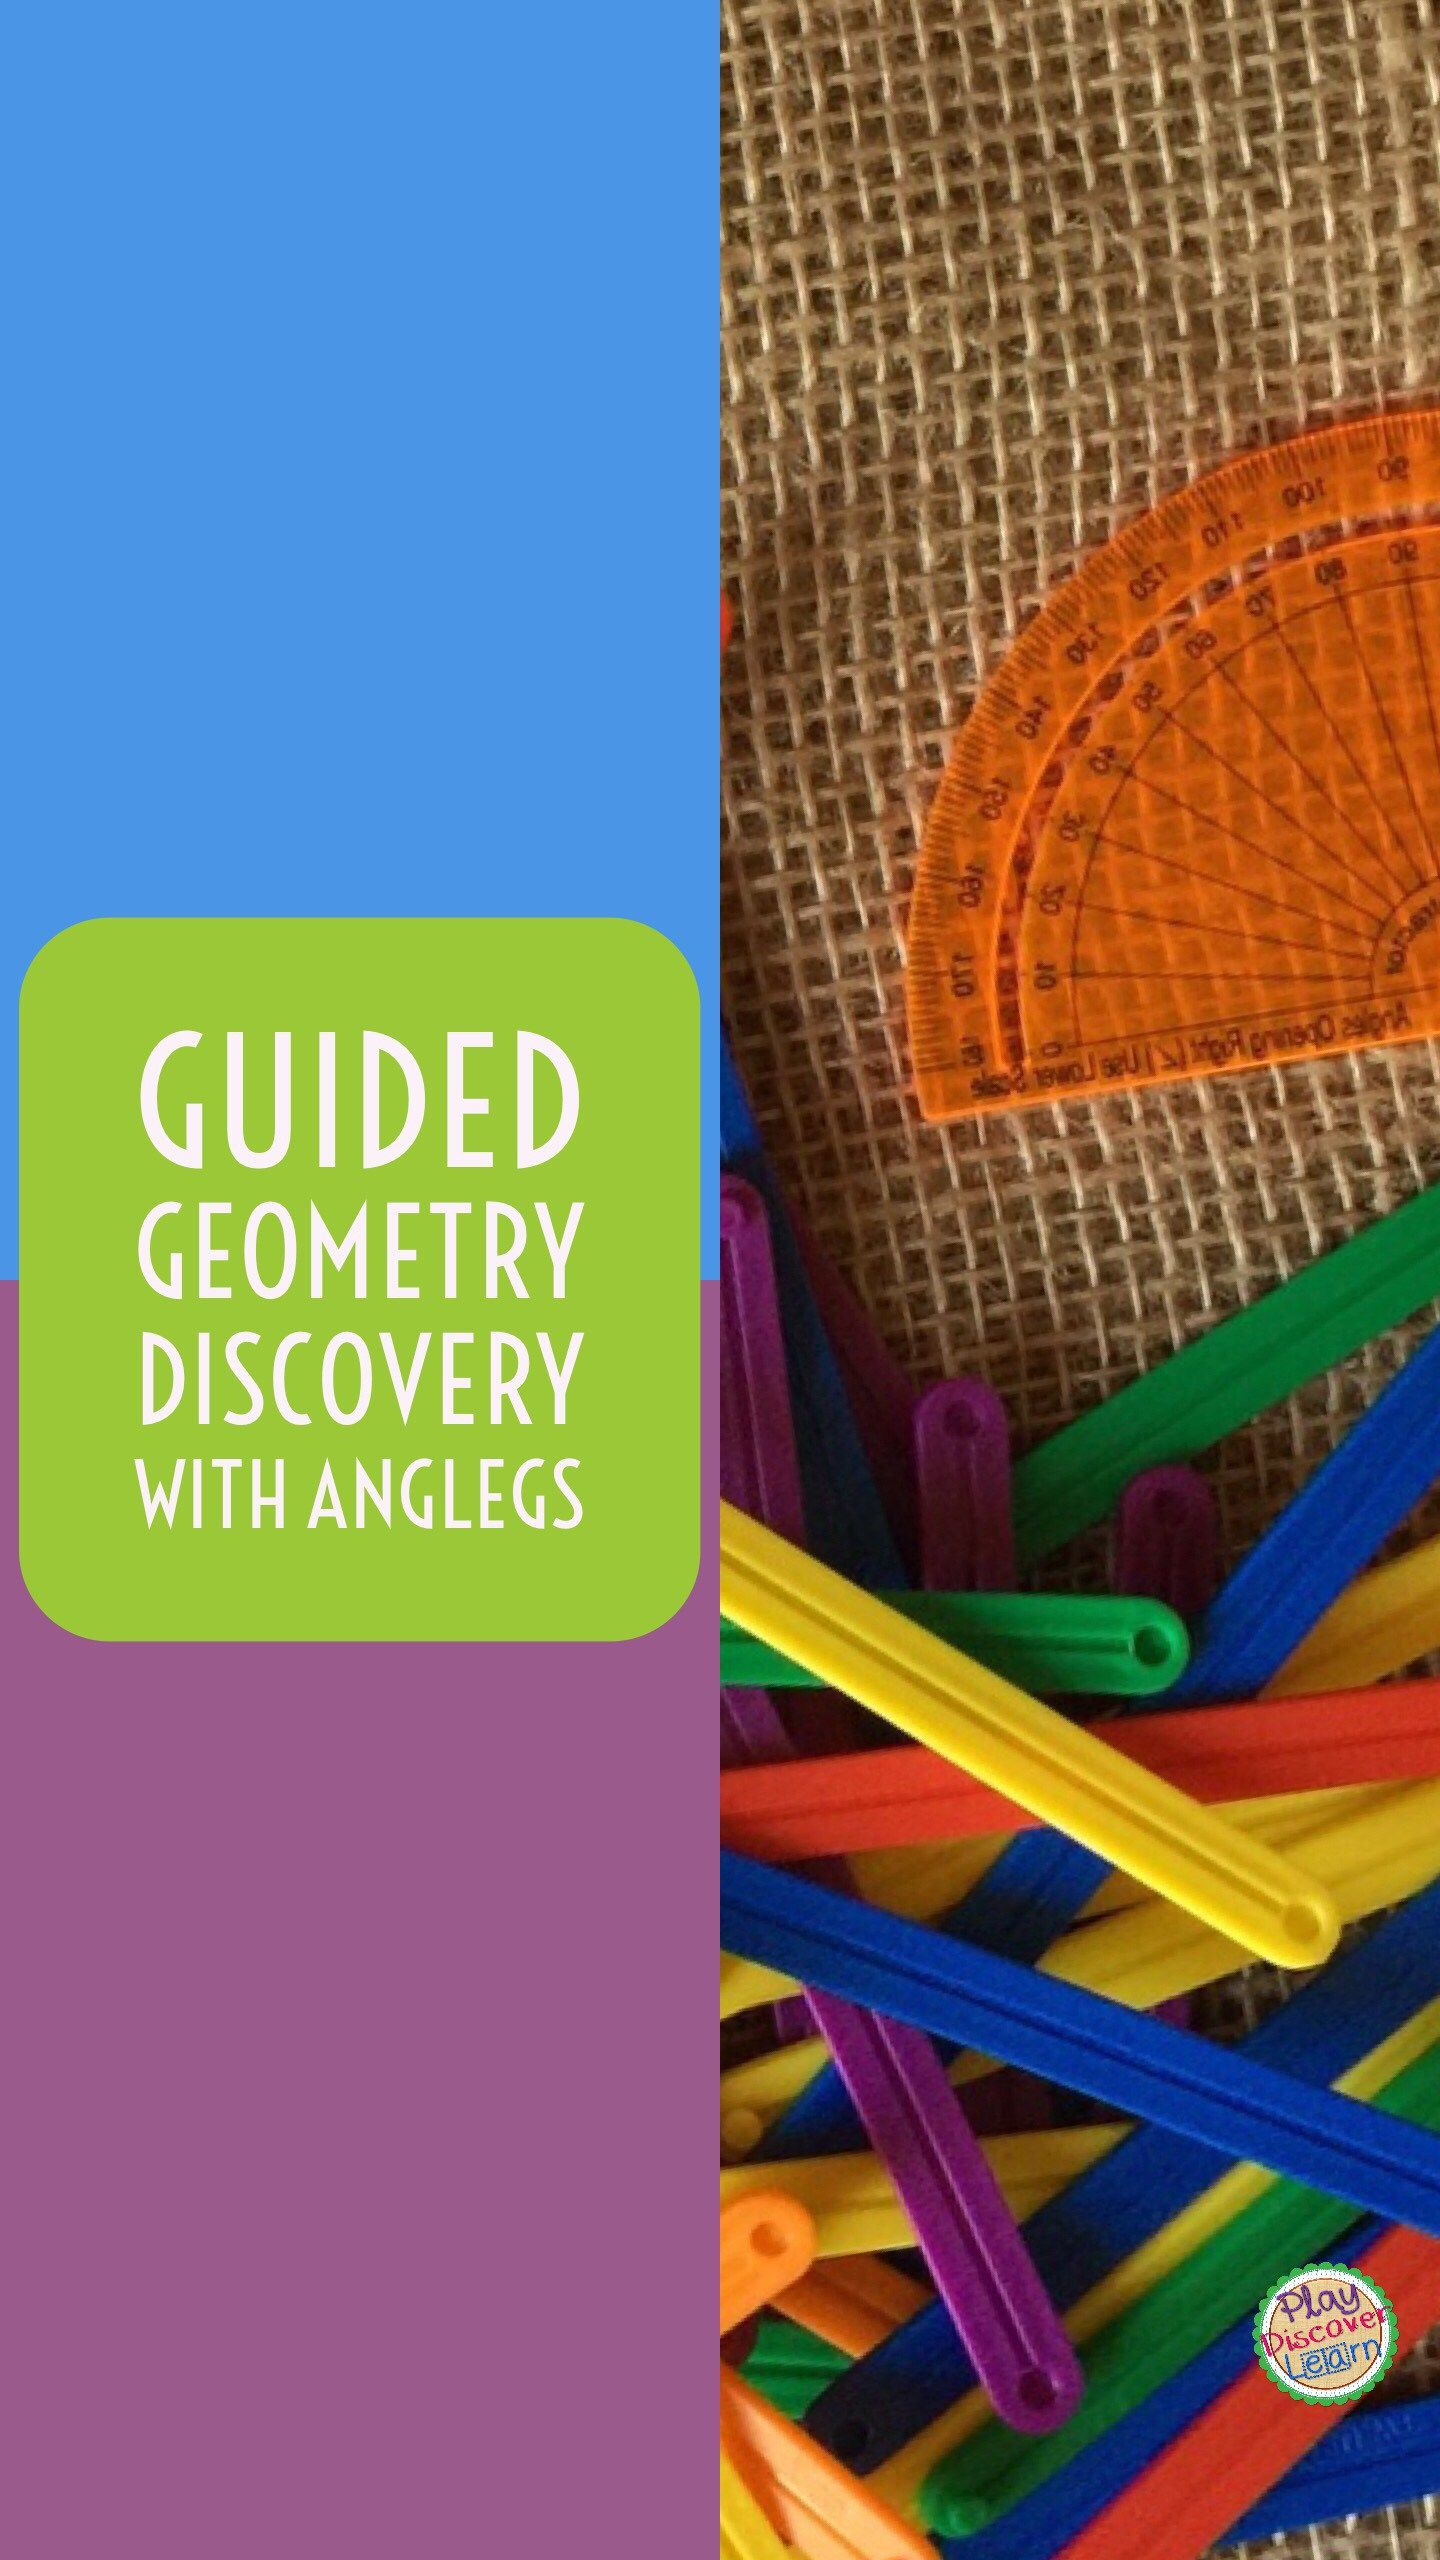 Guided Geometry Anglegs